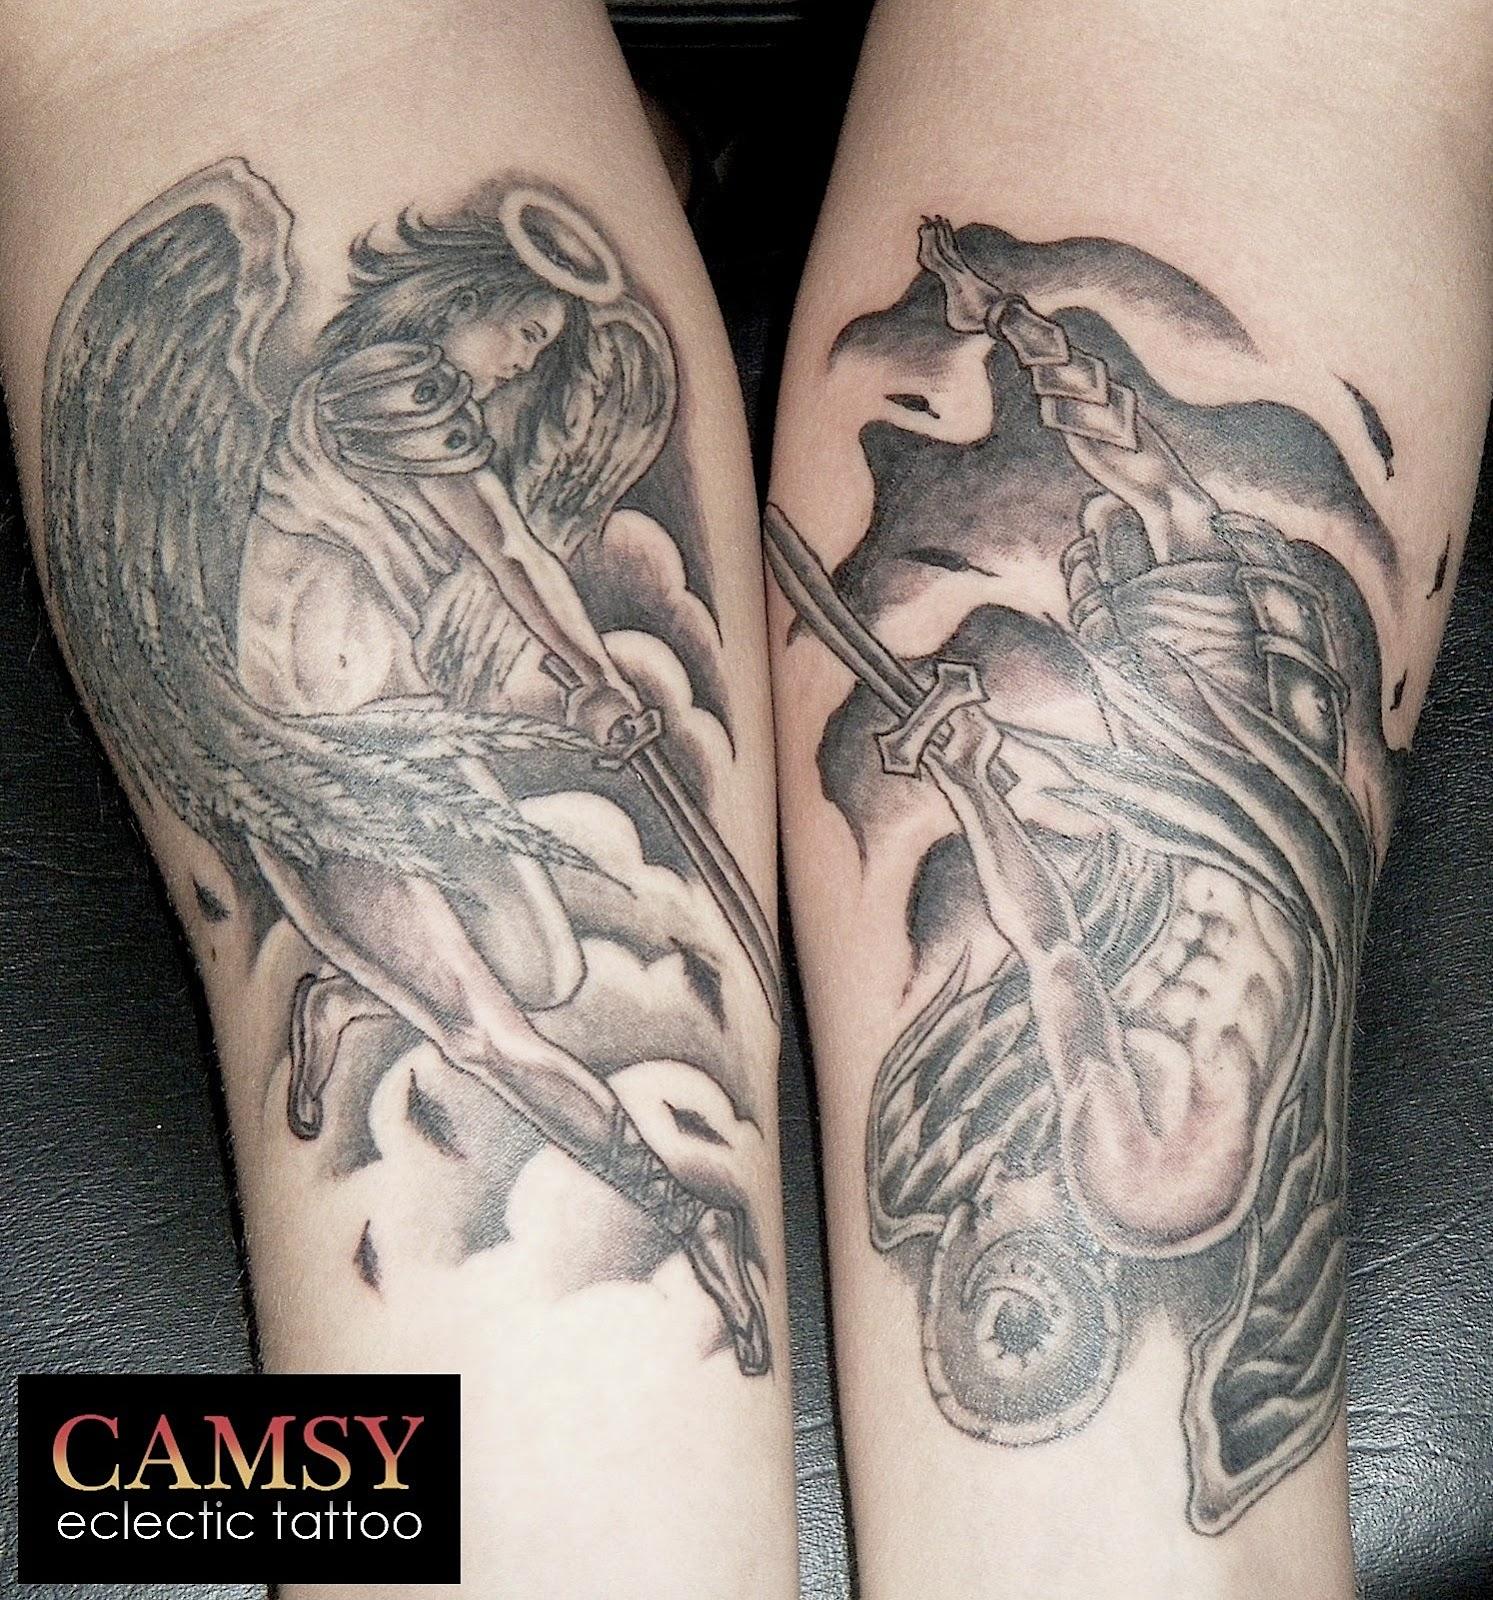 tattooz designs angel devil tattoos designs angel devil tattoos idea. Black Bedroom Furniture Sets. Home Design Ideas